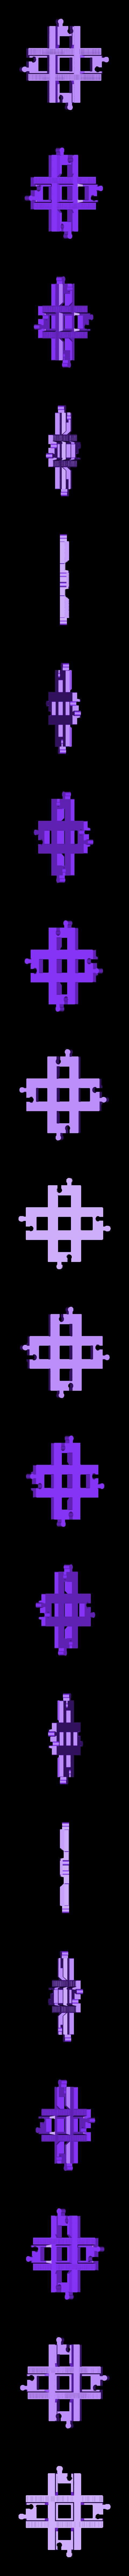 lego_tor_skrzyzowanie_90.stl Download free STL file LEGO Duplo train track: crossing (90°) • 3D printing template, kpawel